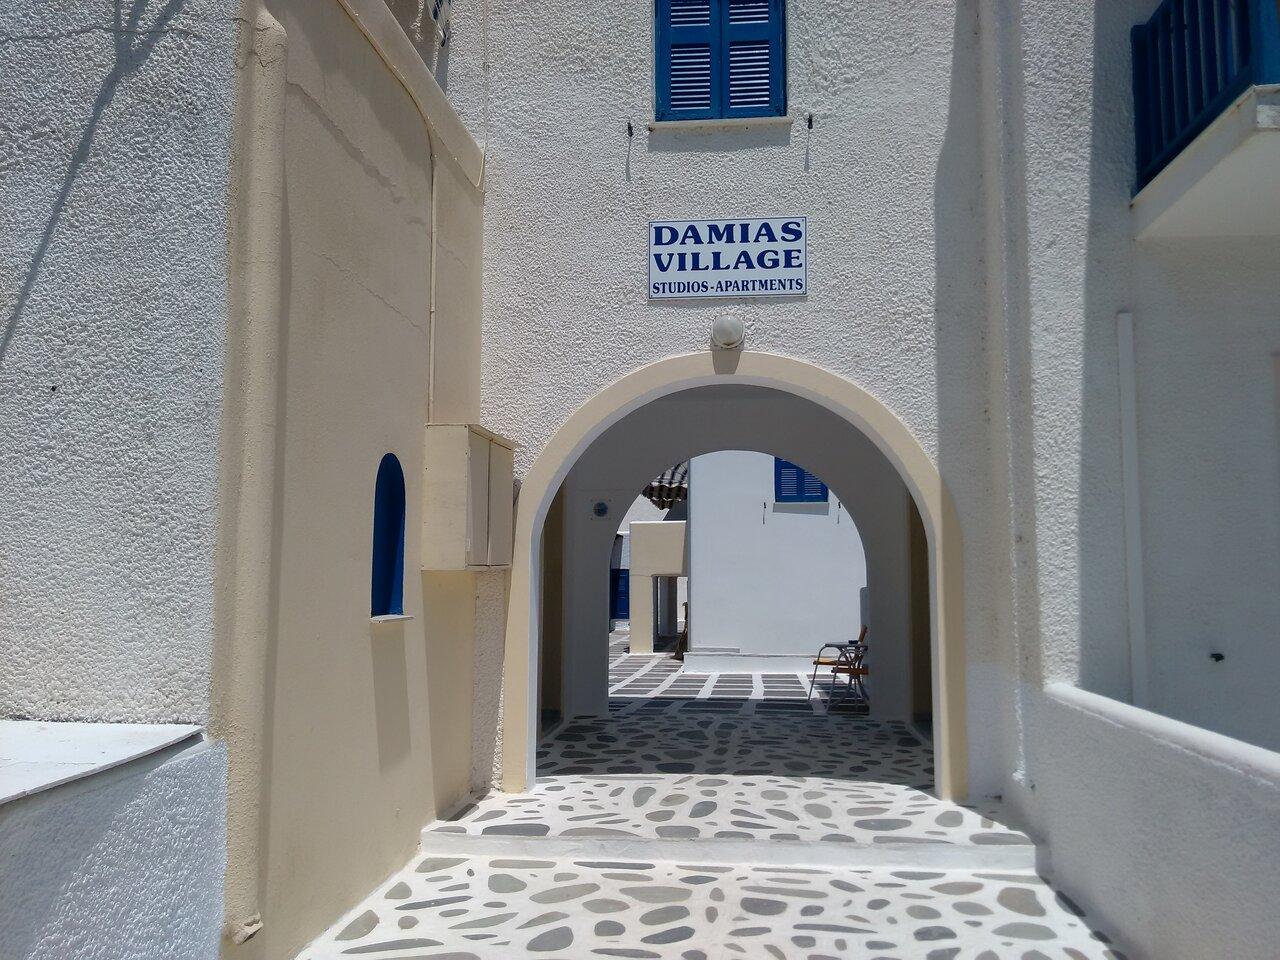 Damias Village